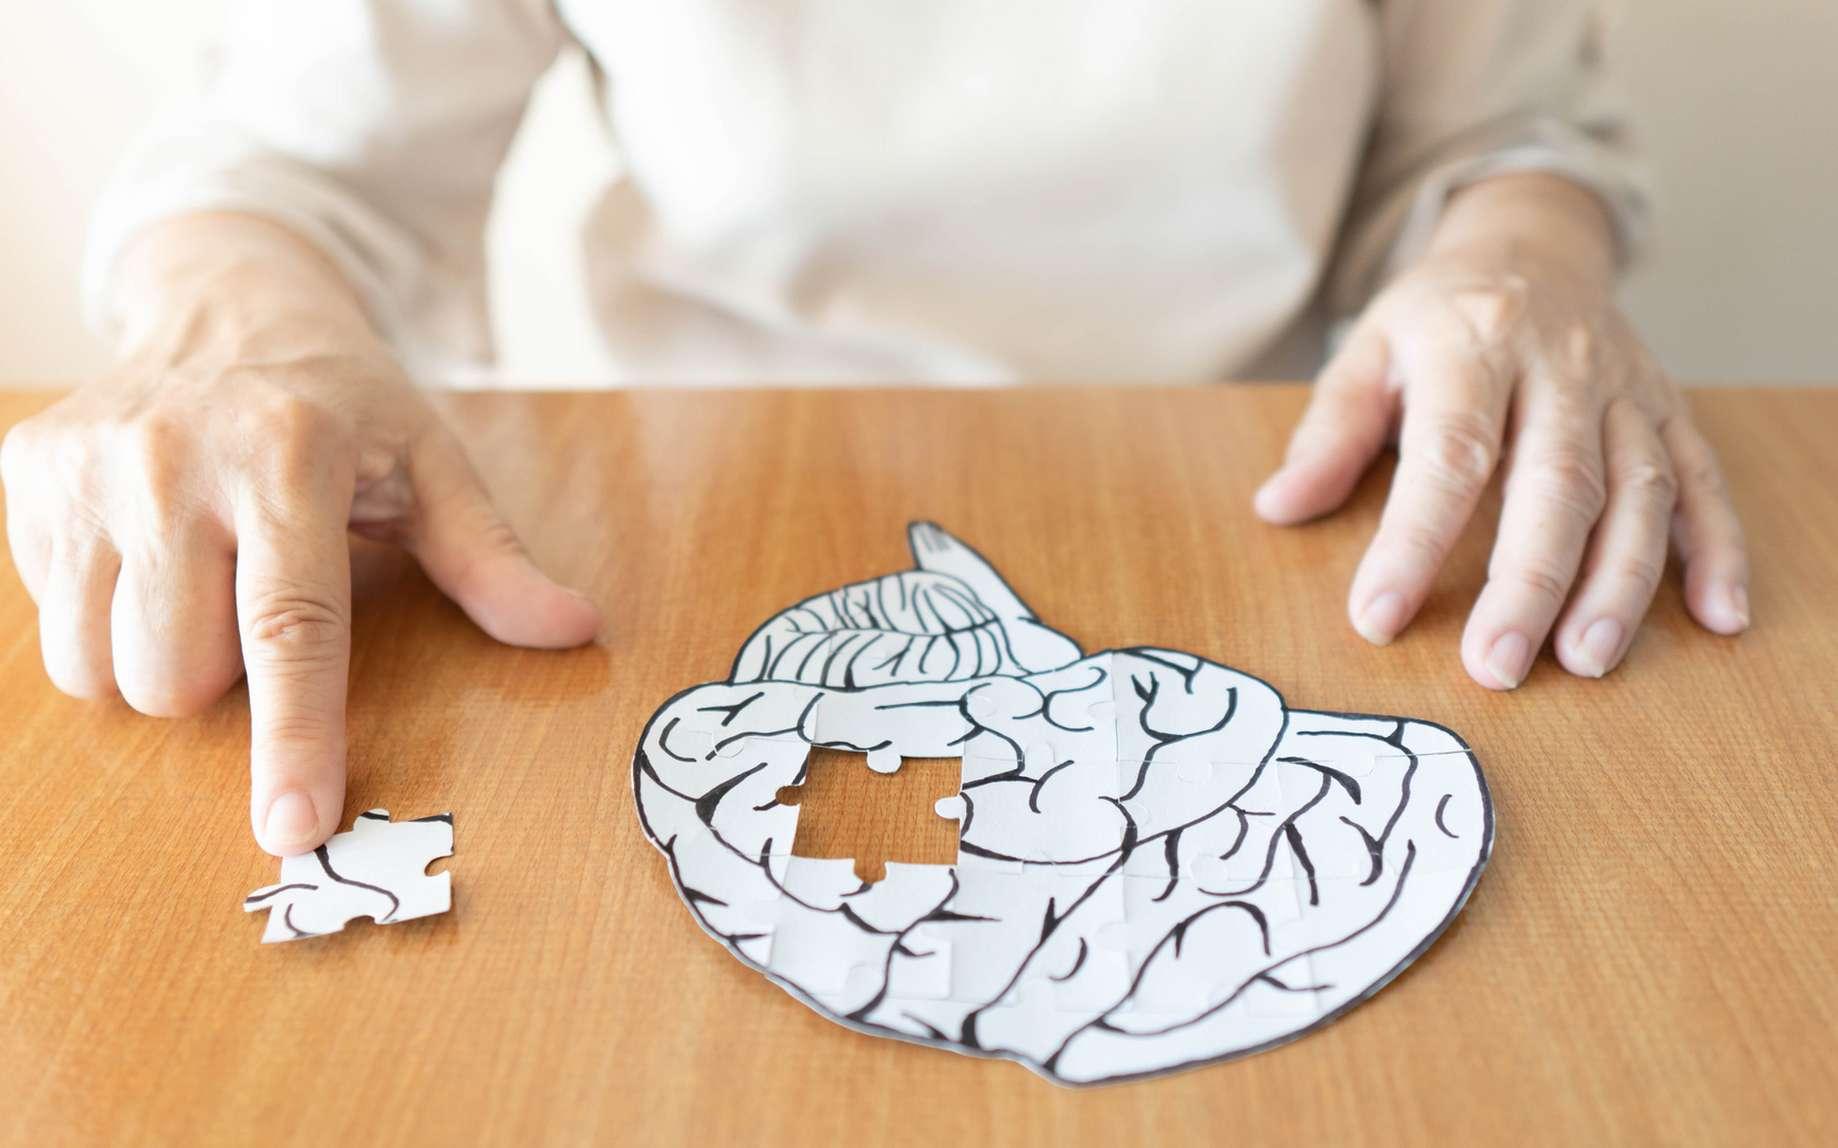 Un cerveau en puzzle. © Orawan, Fotolia